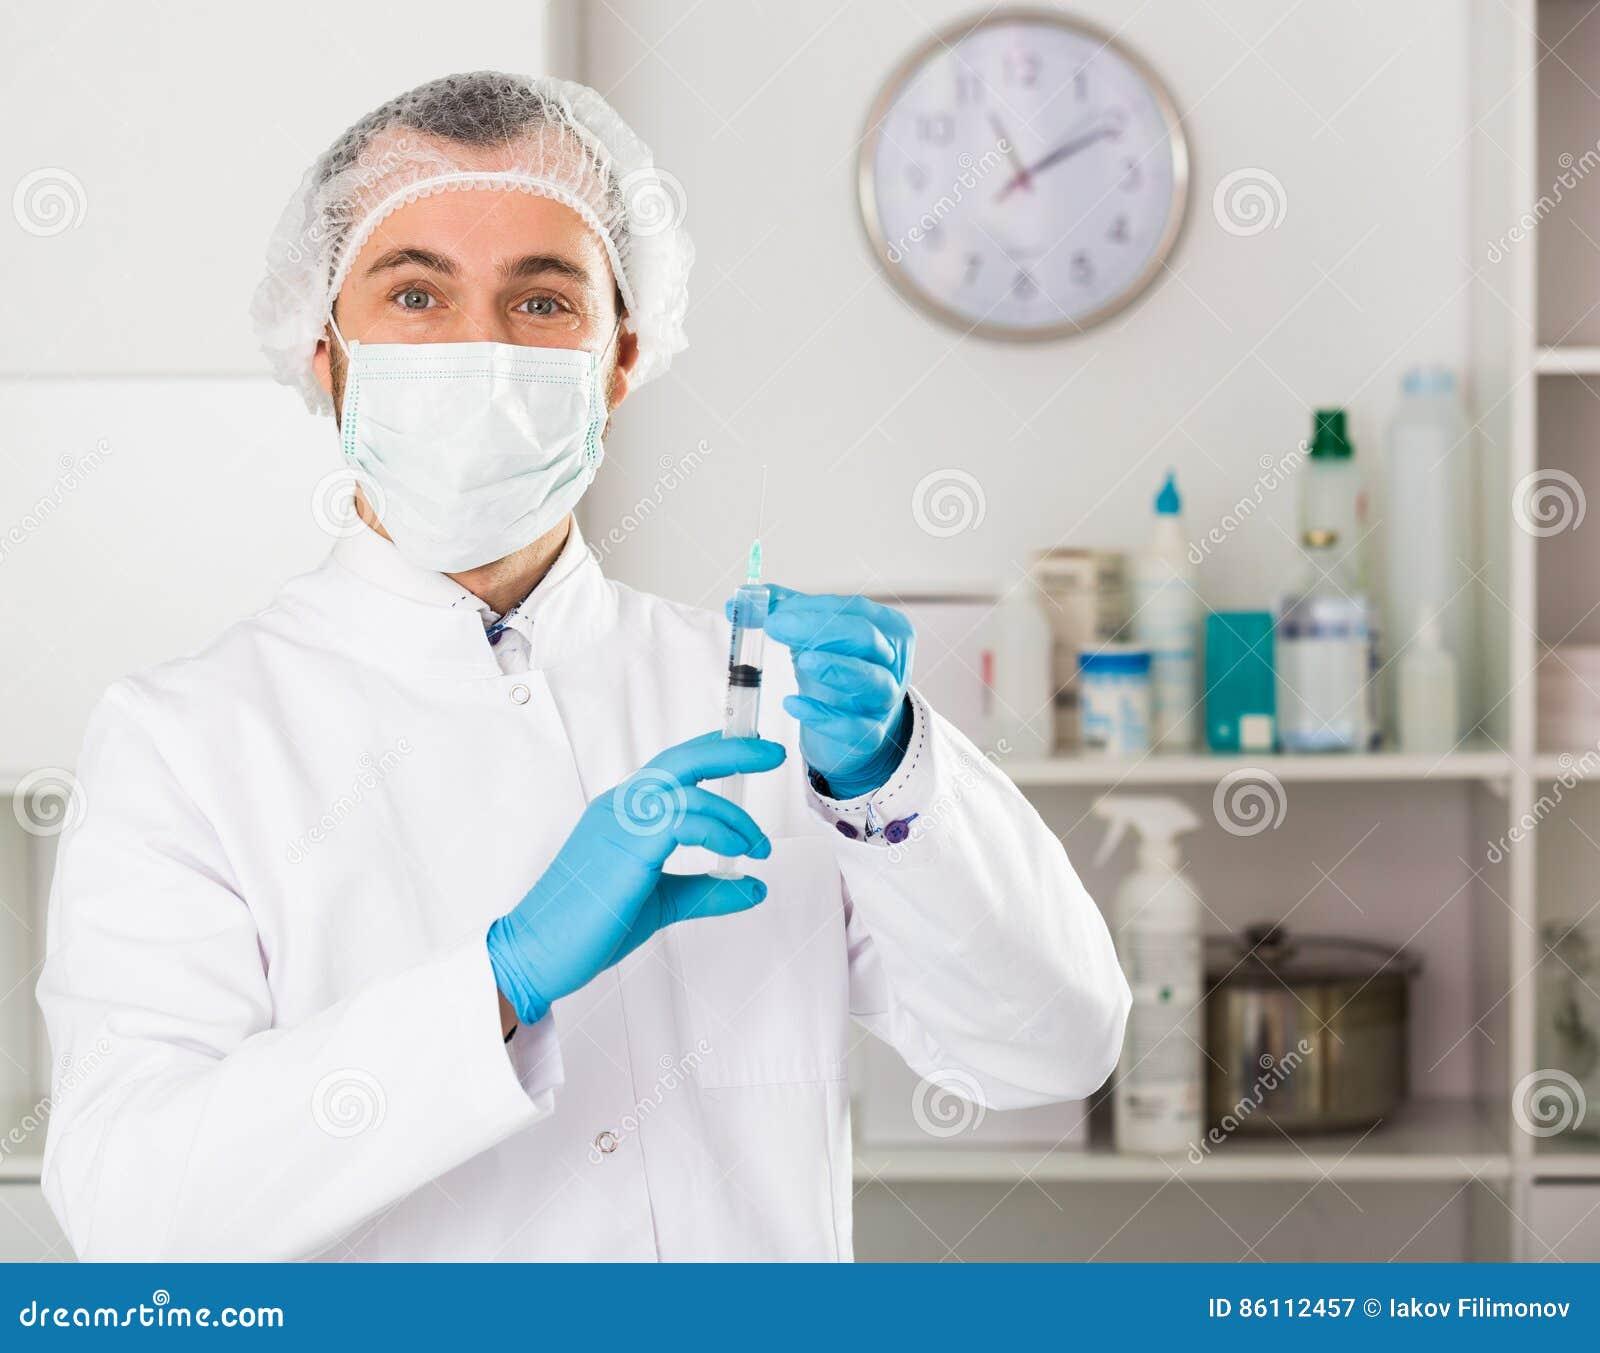 Male Nurse Preparing Injection Stock Image - Image of